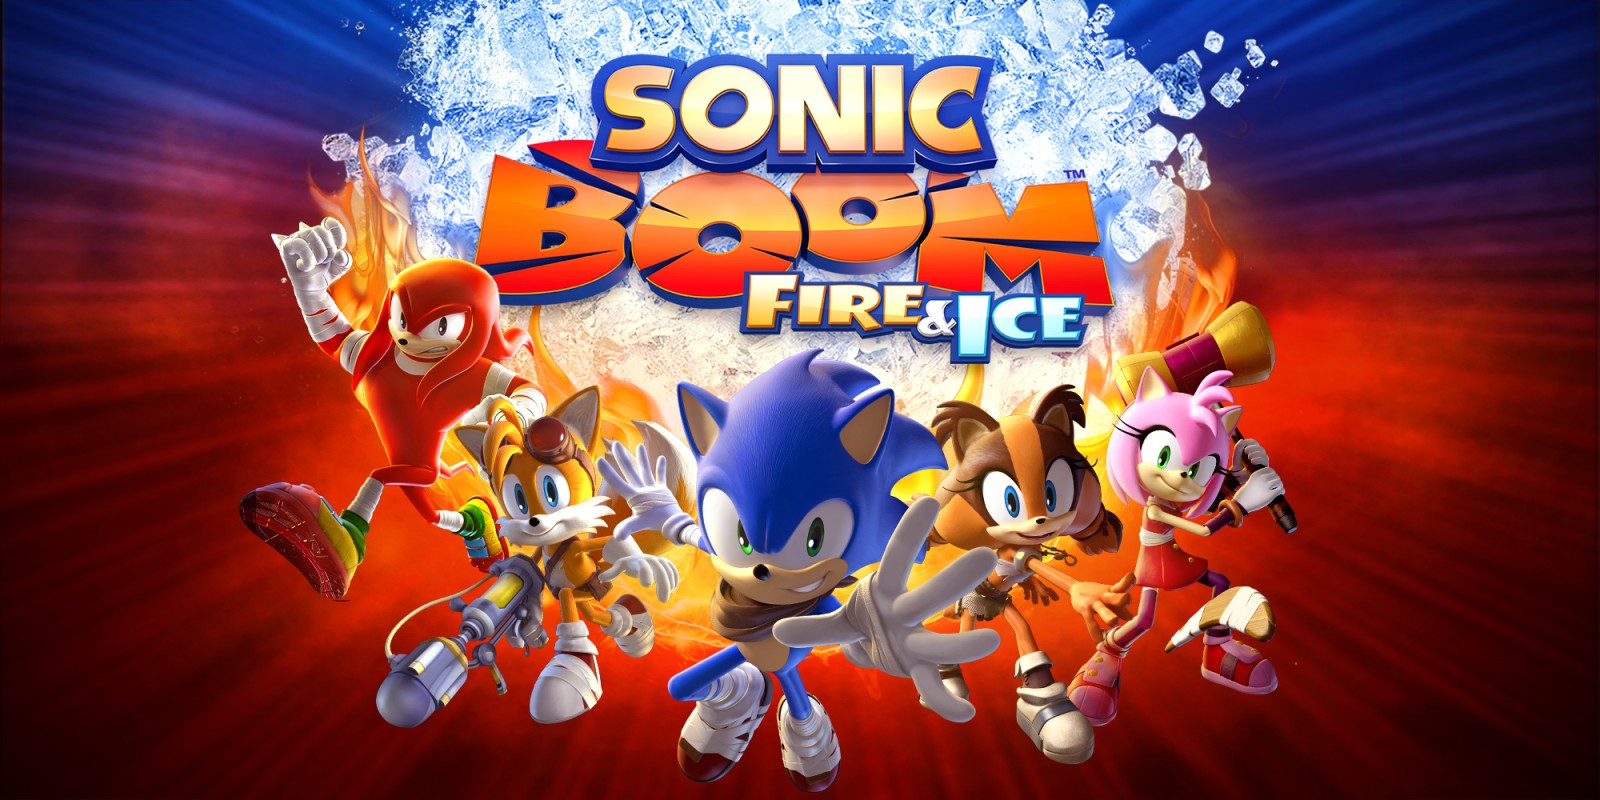 Sonic Boom Fire Amp Ice Nintendo 3ds Games Nintendo